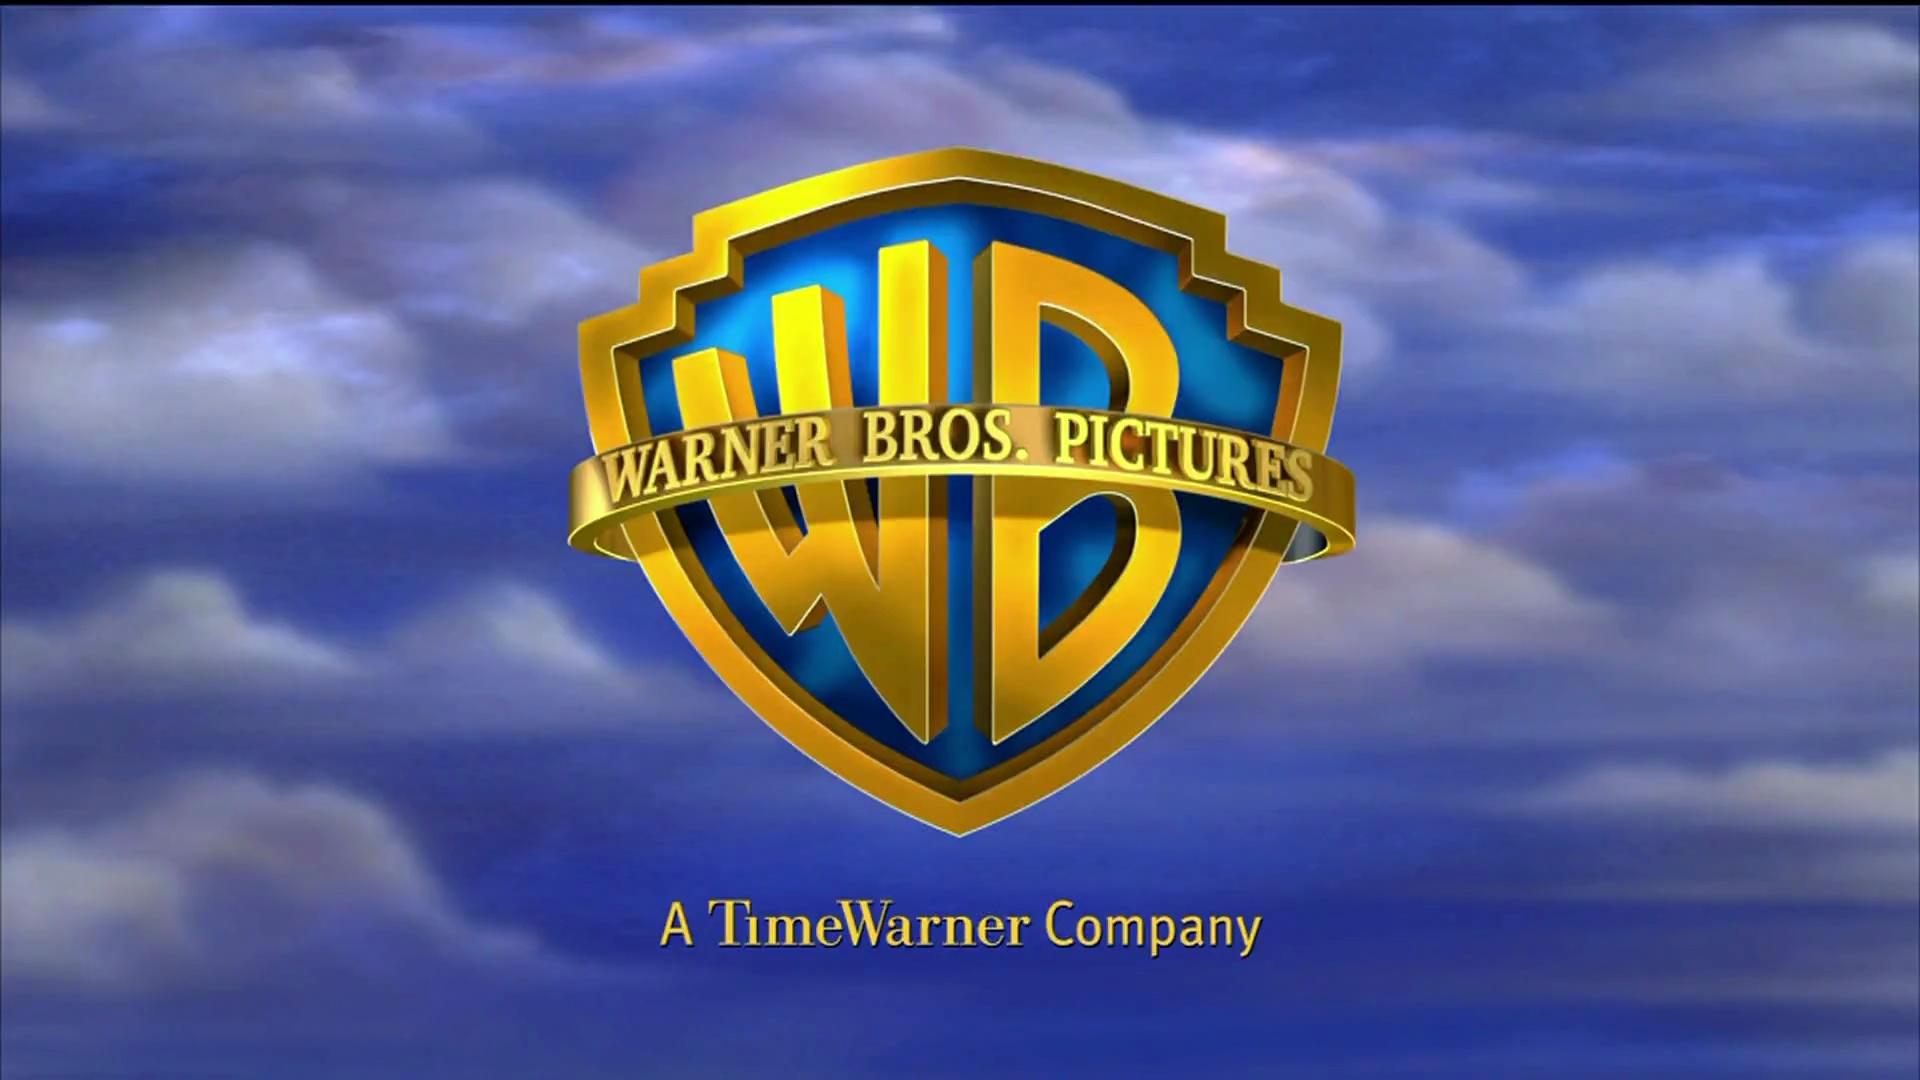 Warner Bros. wyprodukuje polski film. Reżyserką Aleksandra Terpińska